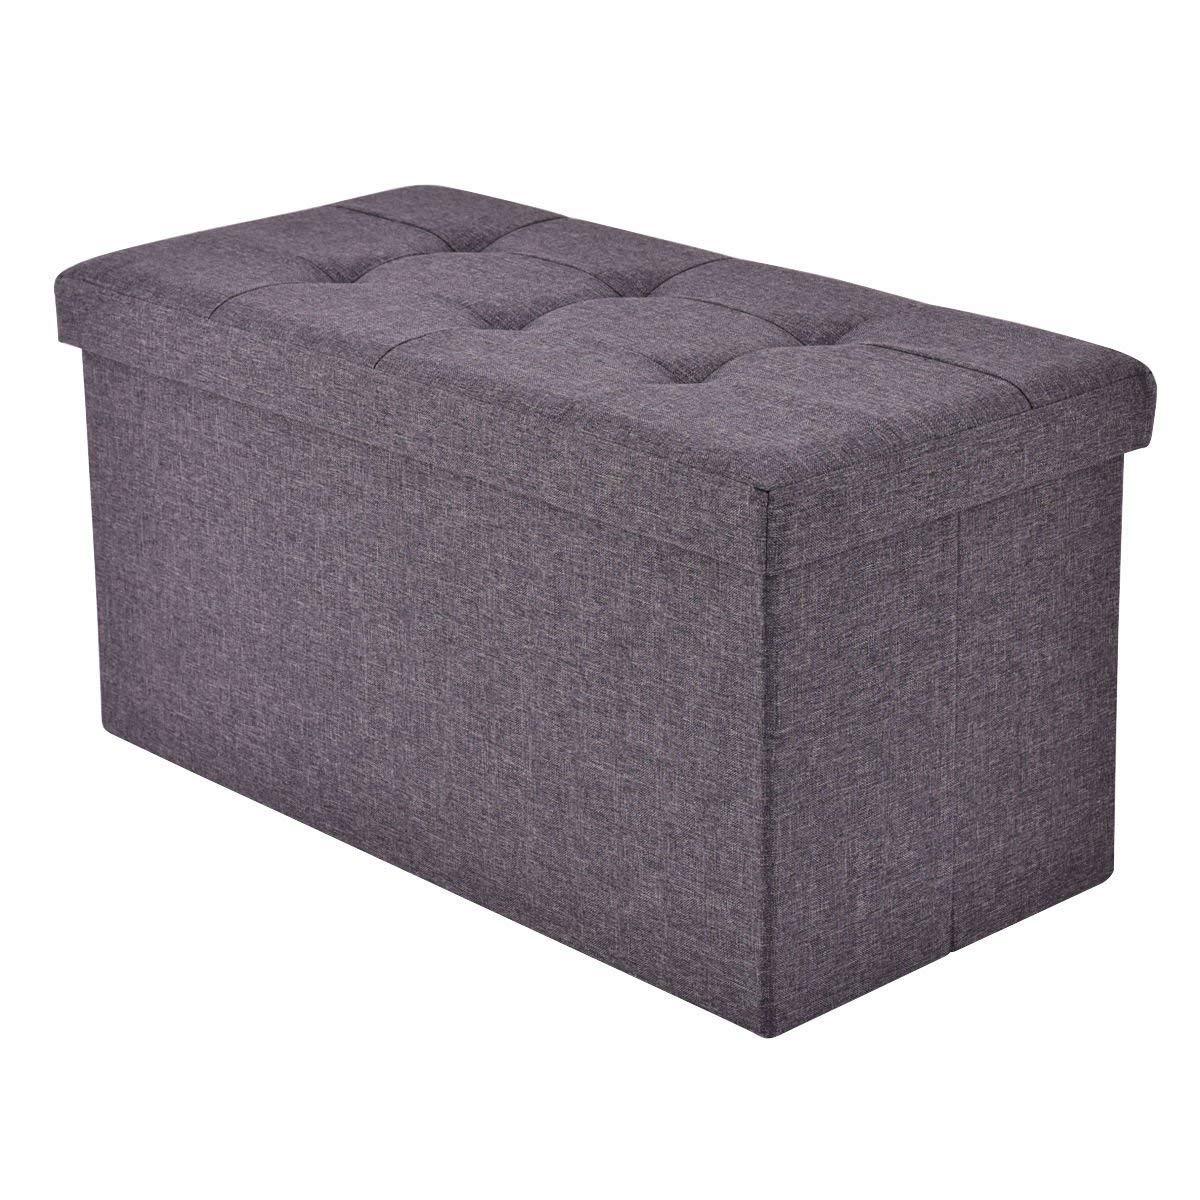 Awesome Amazon Com Allgoodsdelight365 Folding Rect Ottoman Bench Inzonedesignstudio Interior Chair Design Inzonedesignstudiocom